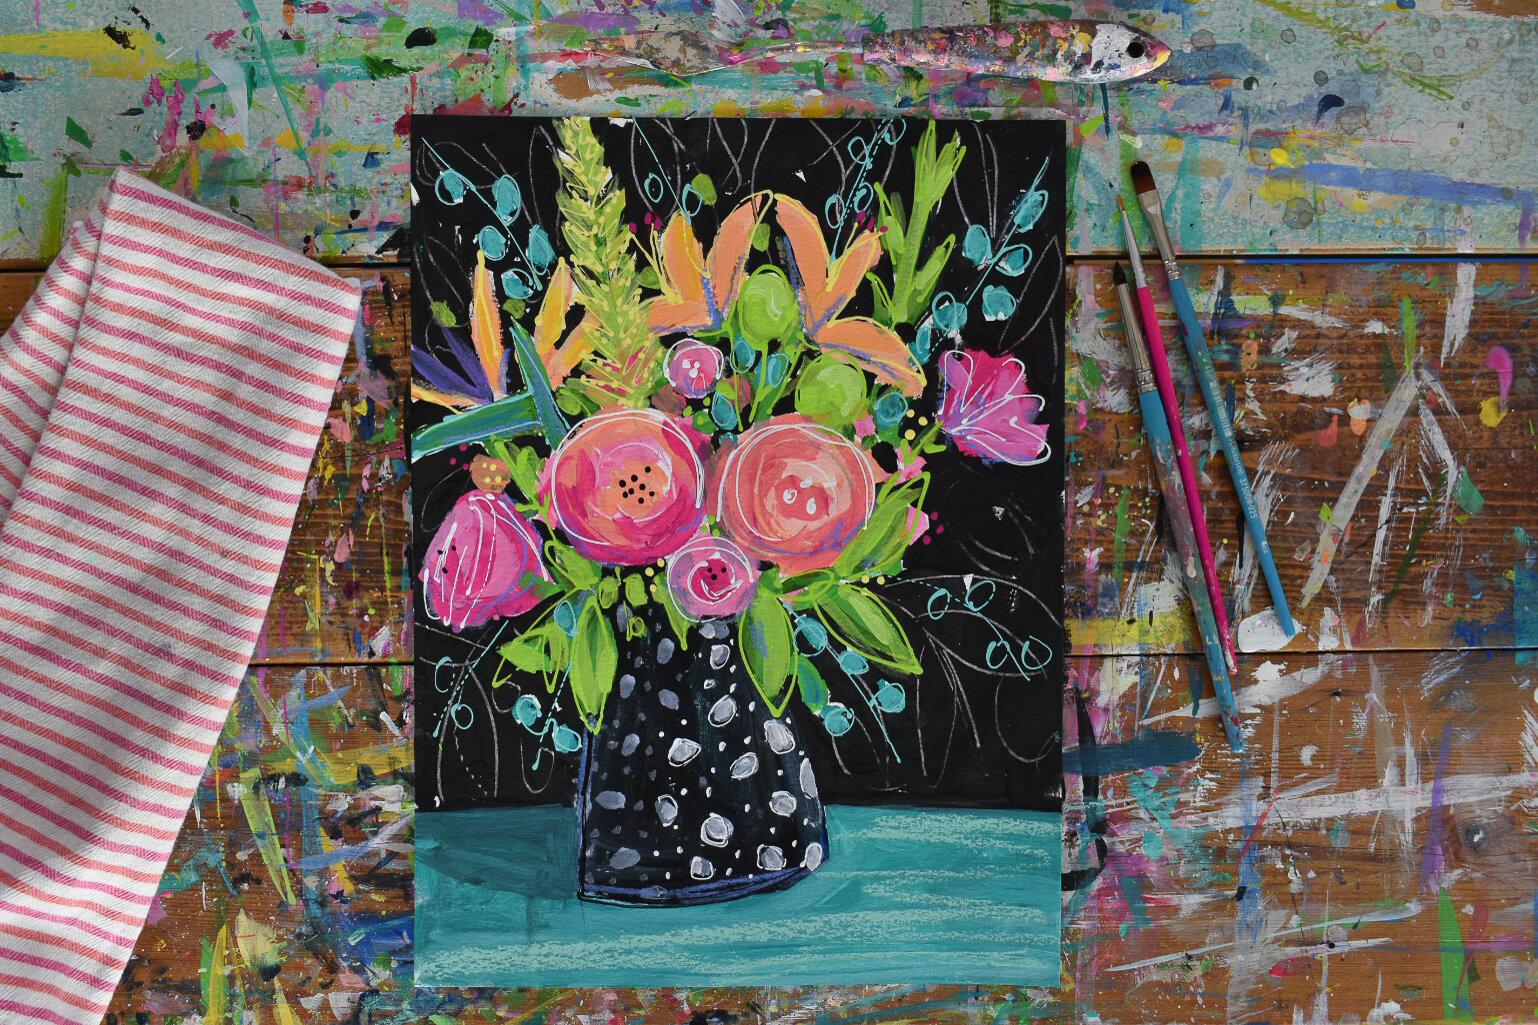 boho_painting_flowers_eclectic_daisyfaithart_4.jpg